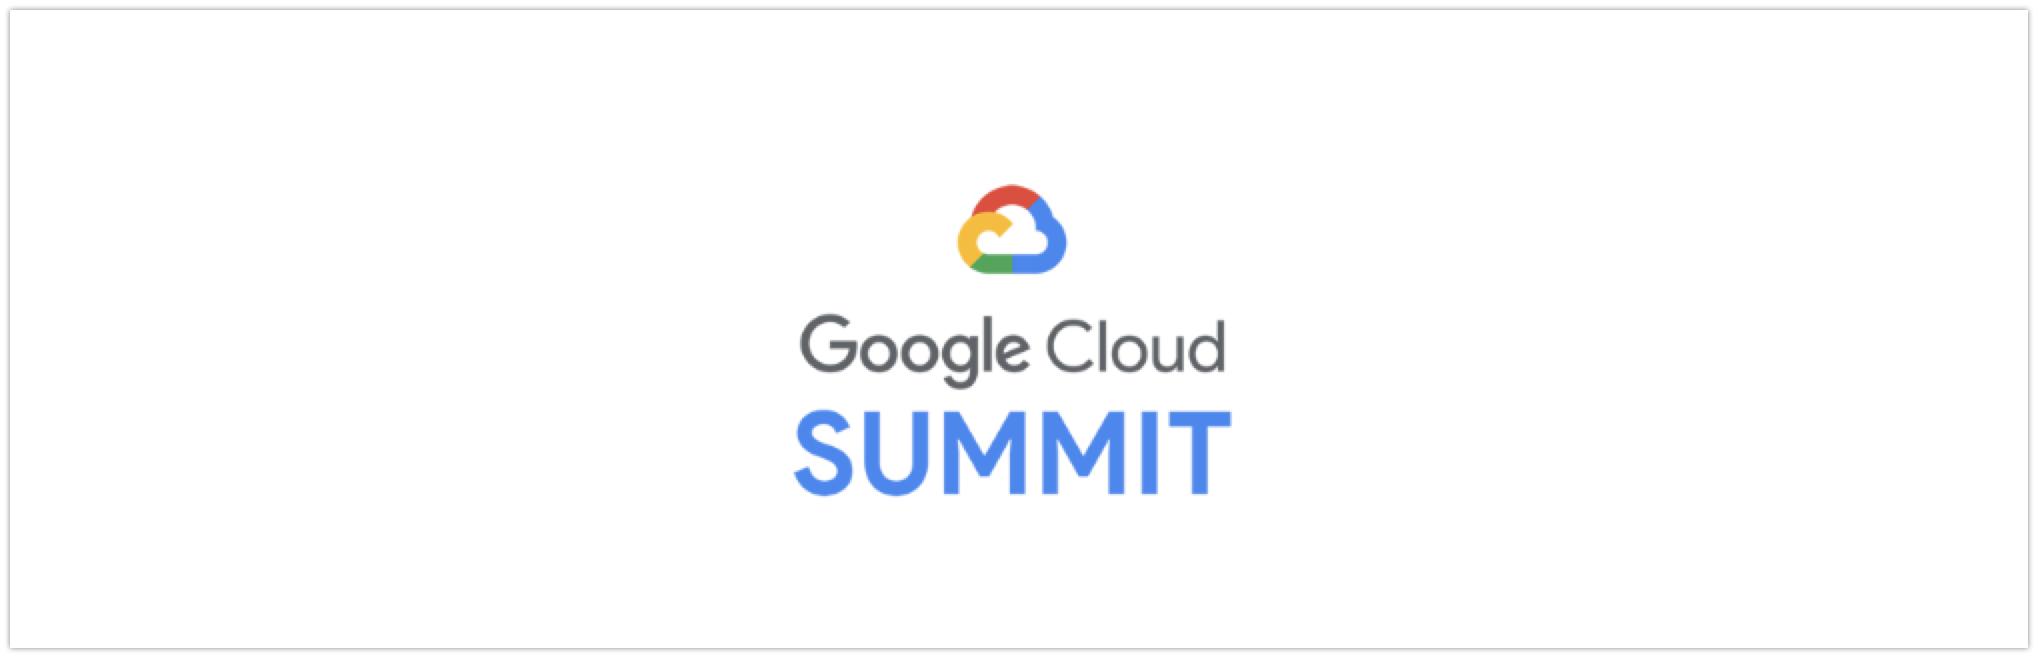 Google Cloud Summit 2018